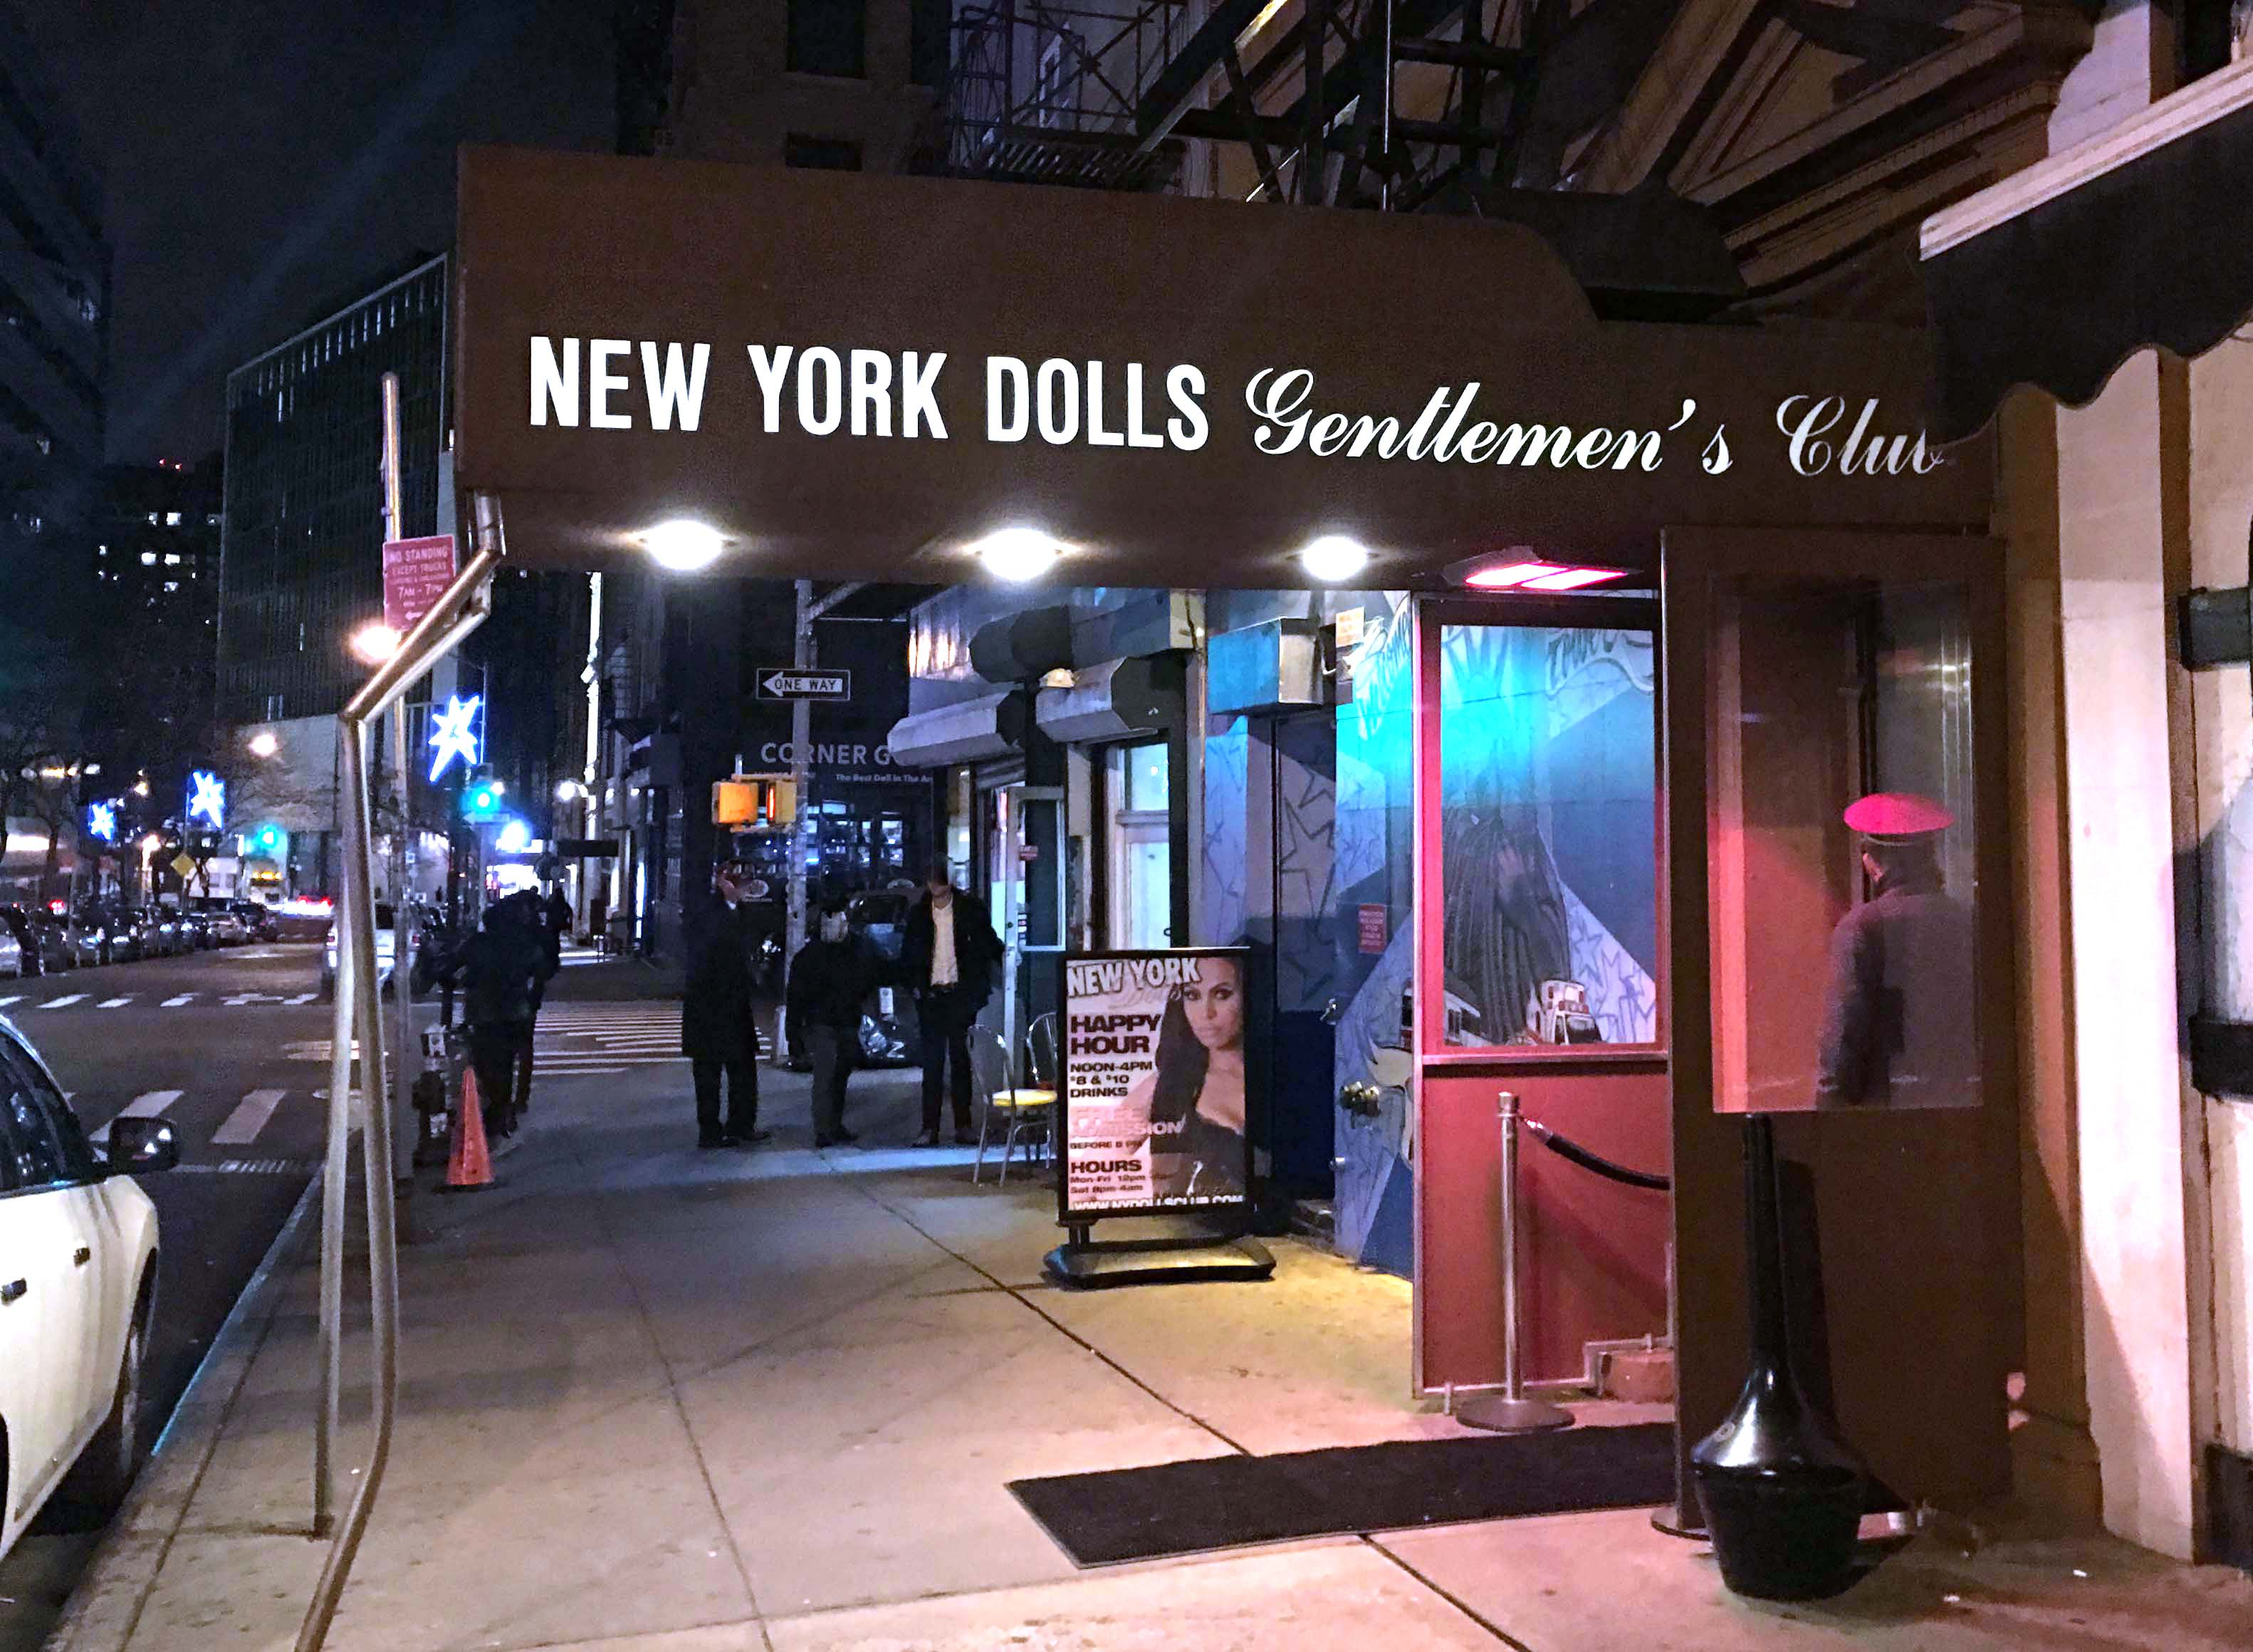 New York Dolls entrance